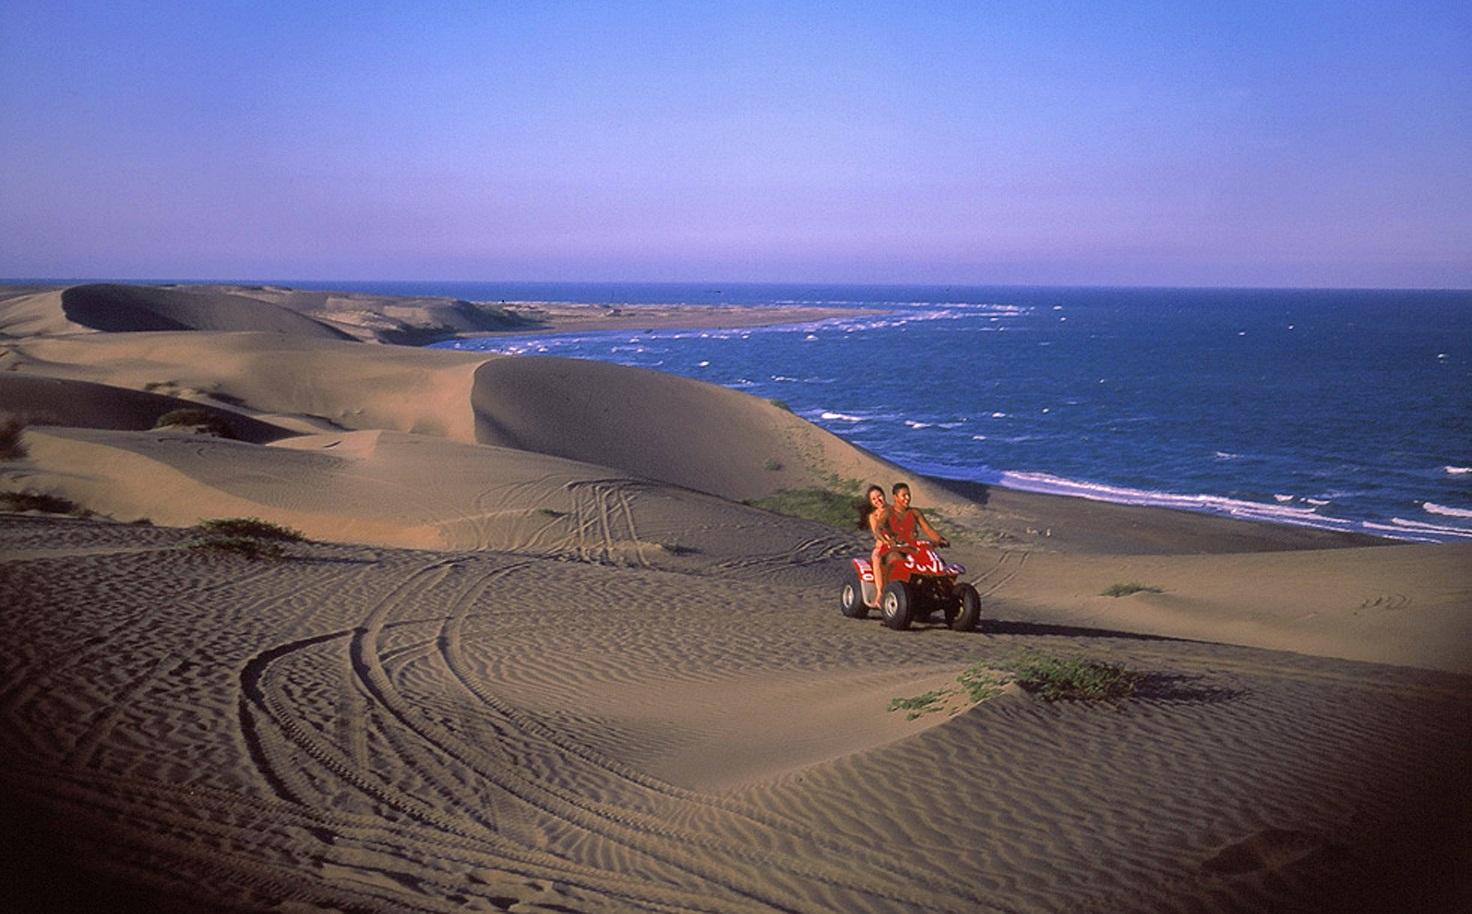 Fotos de Tecolutla Veracruz Mexico  Fotos de Playas de